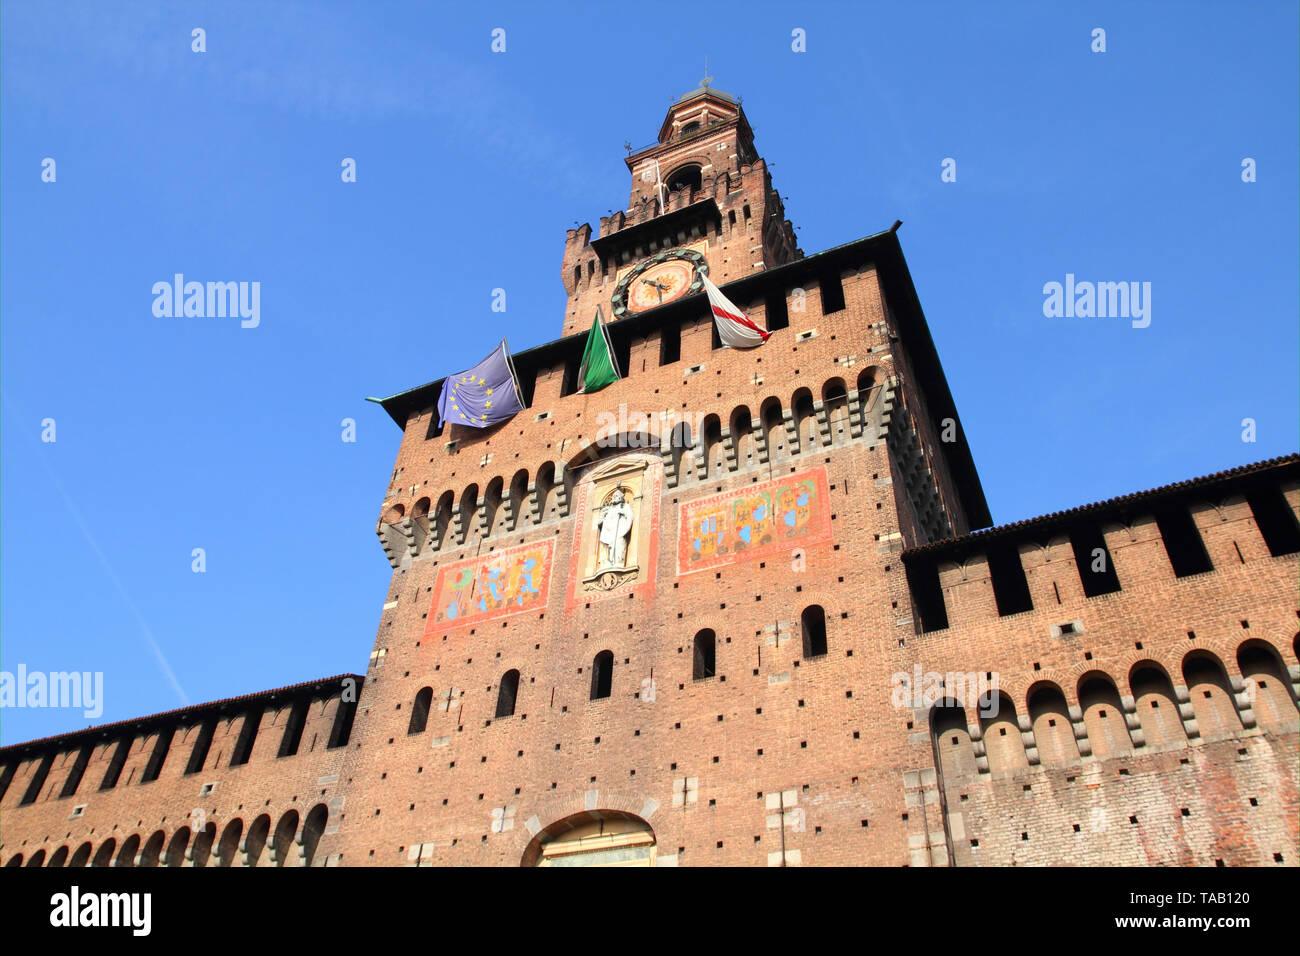 Milan, Italy. Castello Sforzesco (Sforza Castle) - old landmark of Lombardy. - Stock Image